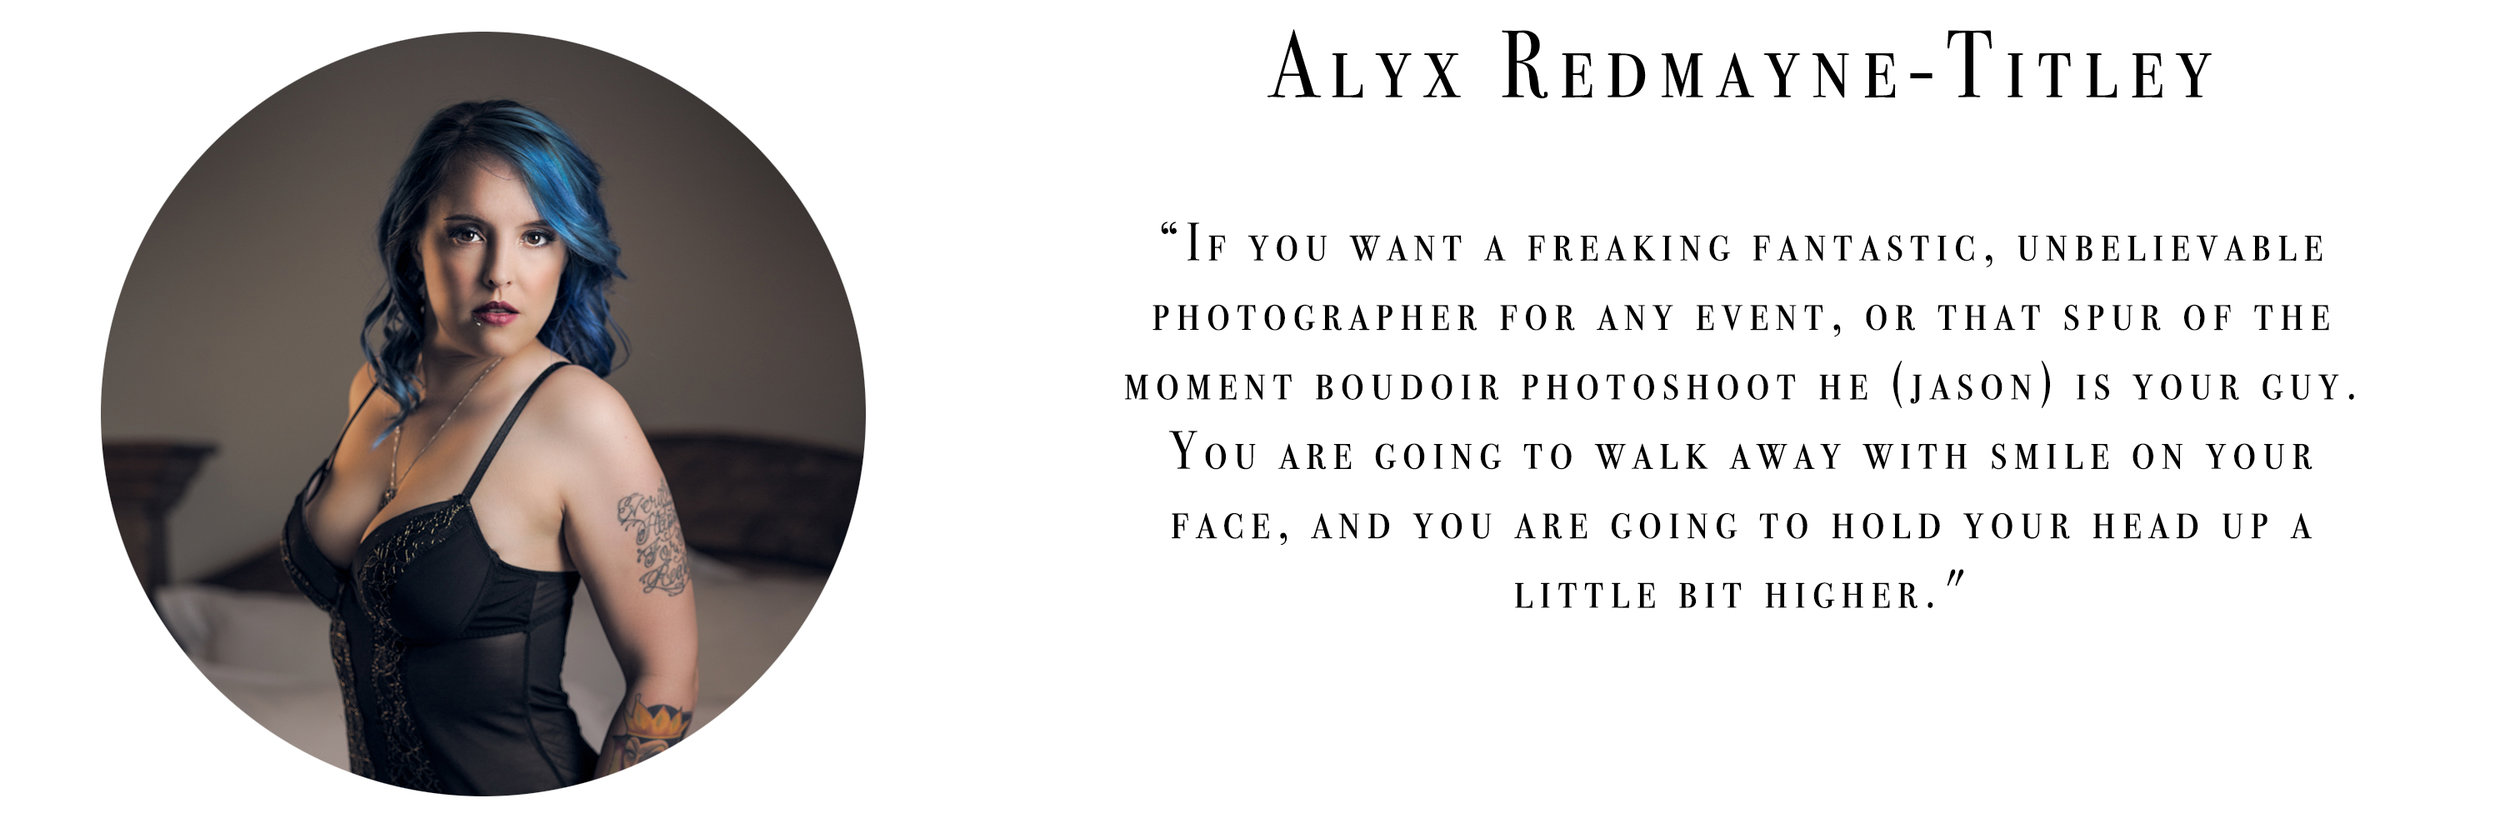 Alyx.jpg